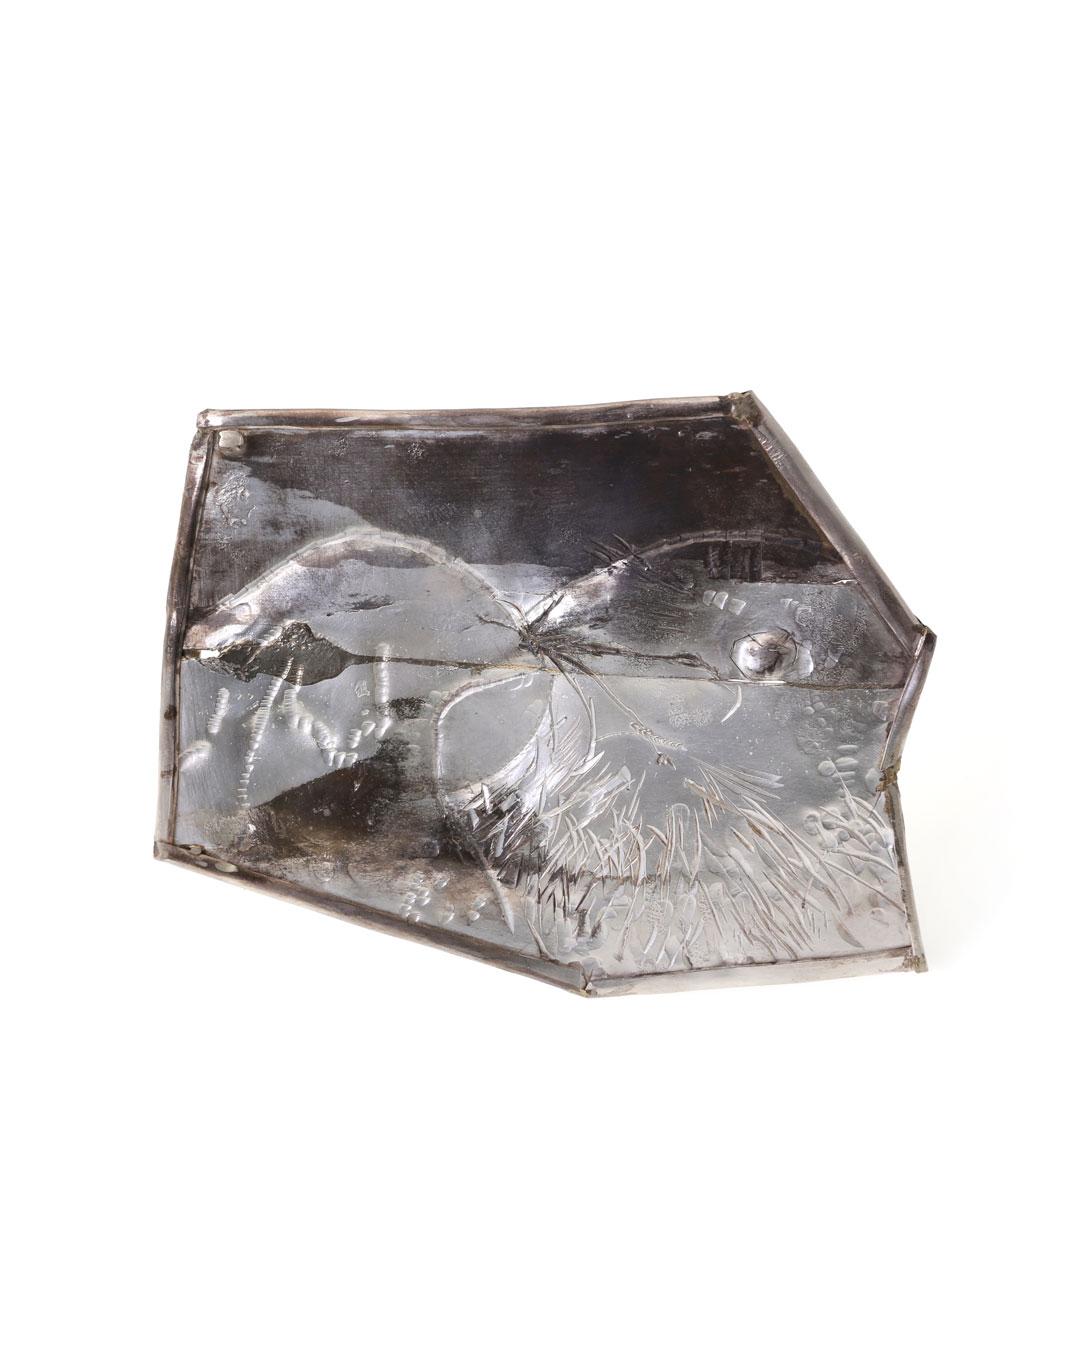 Rudolf Kocéa, Two Jackdaws, 2017, brooch; silver, copper, 140 x 110 x 8 mm, €3000